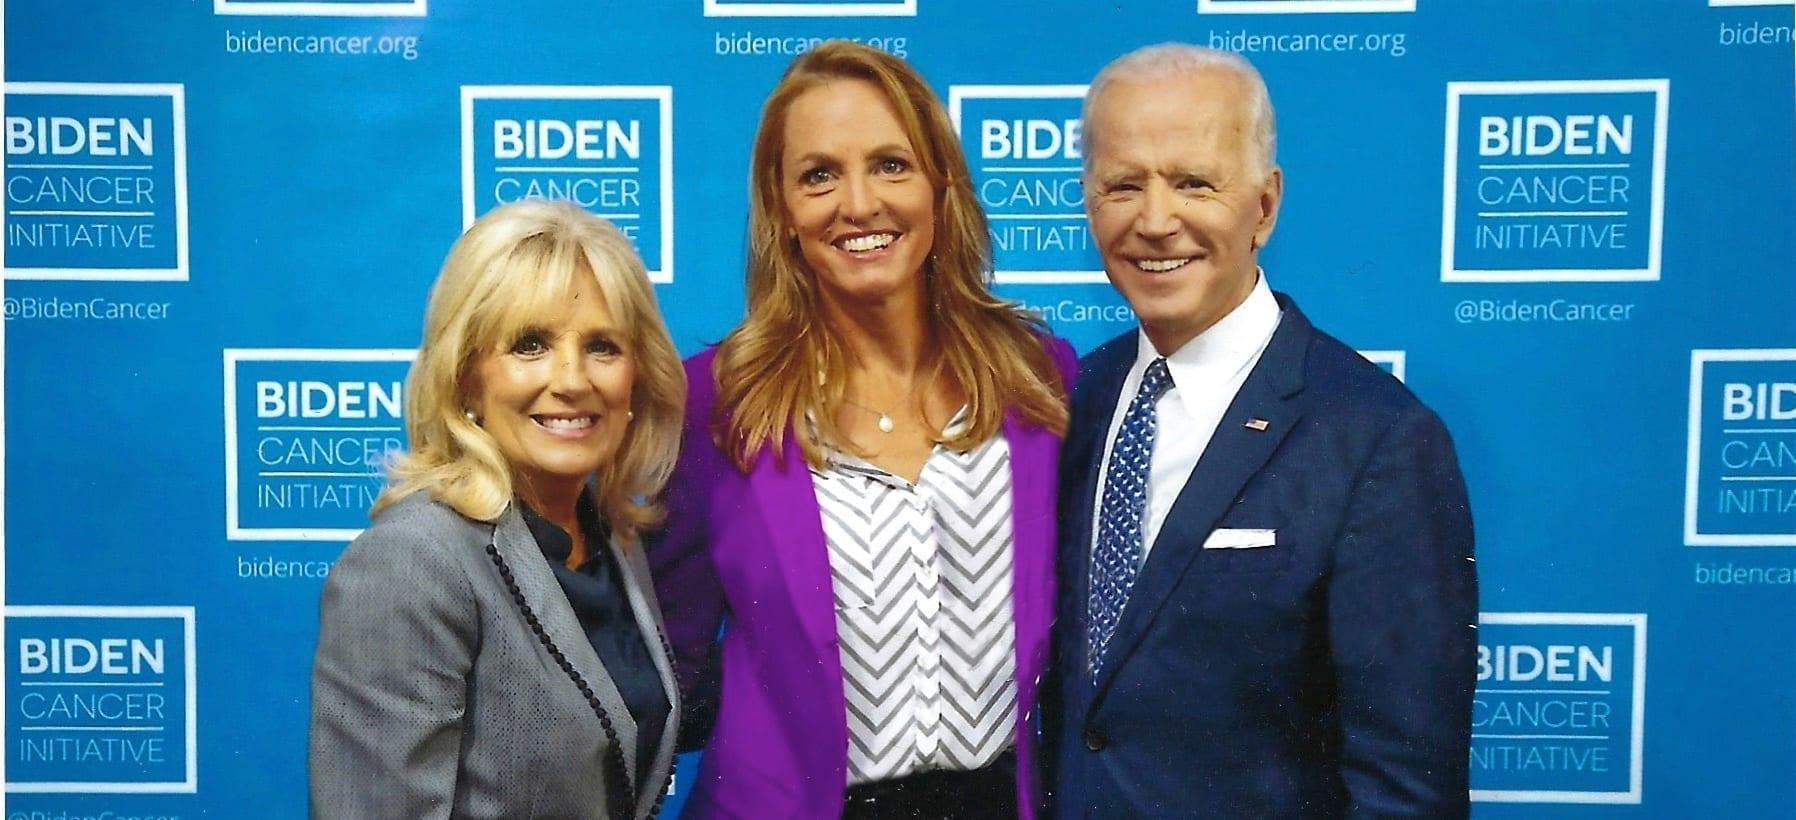 Thank You Biden Cancer Initiative